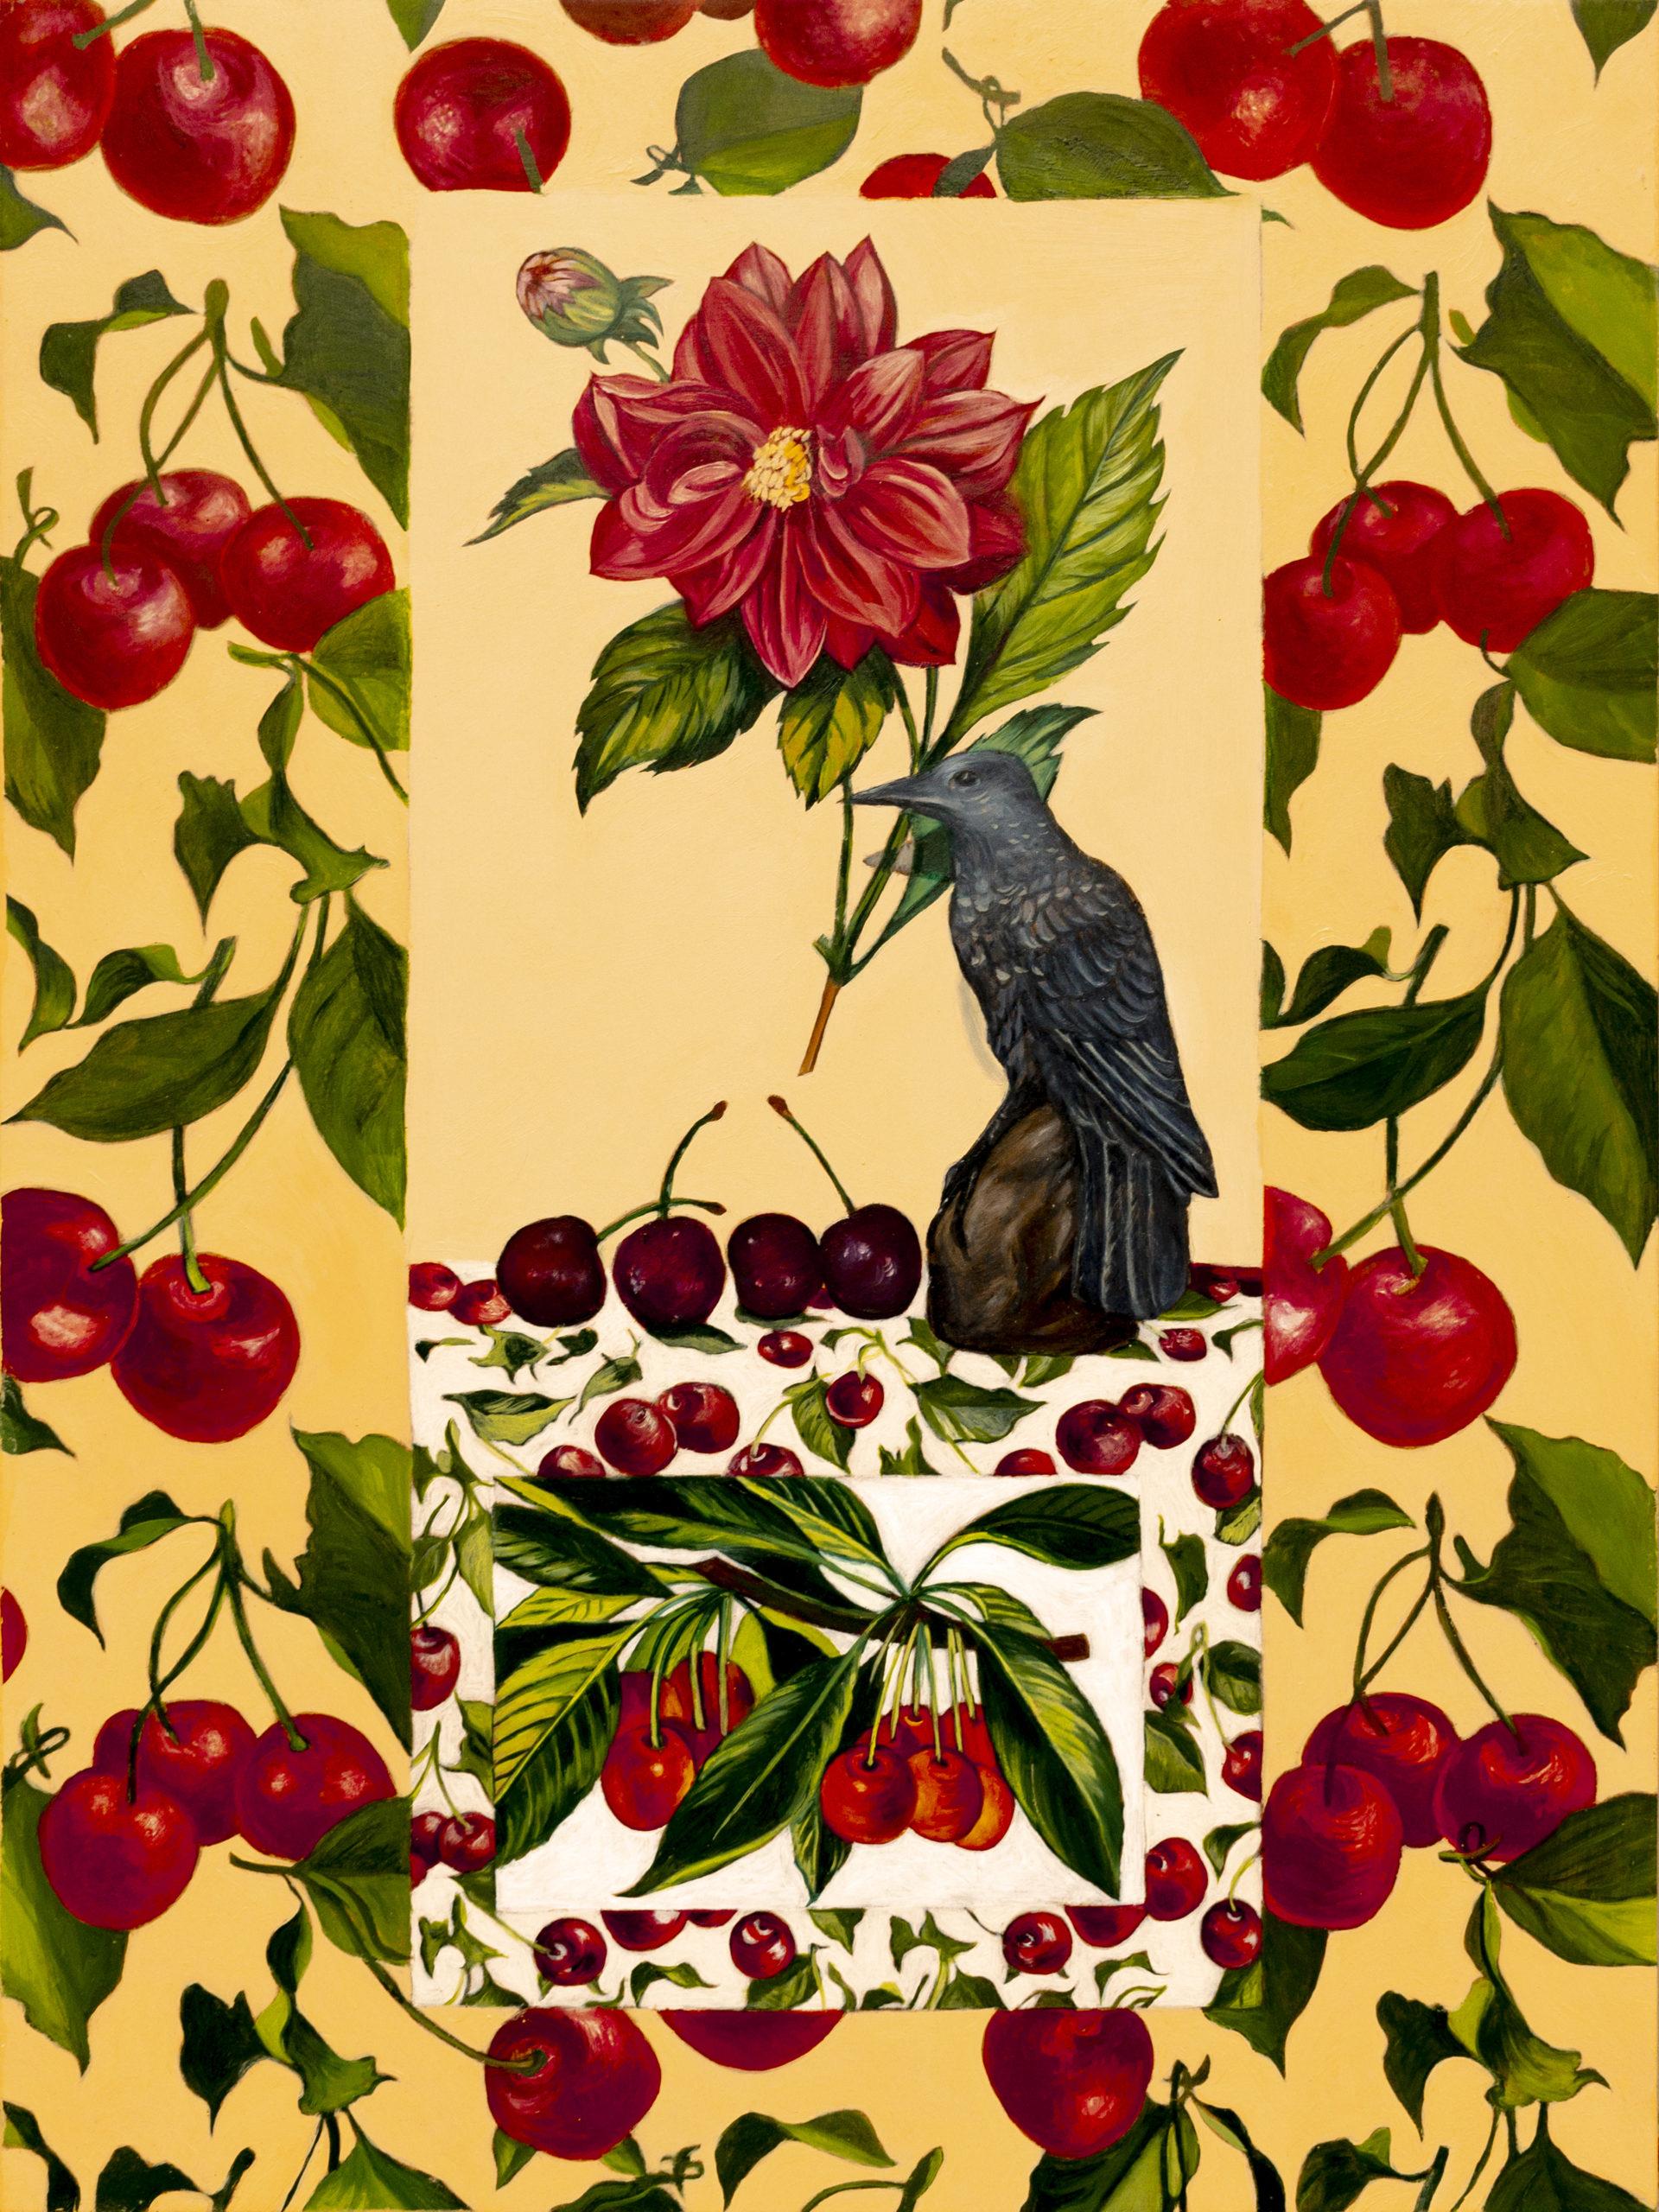 Jacklyn St. Aubyn; Cherry Universe, 2019; Oil on panel. Photo by Joshua Rose.